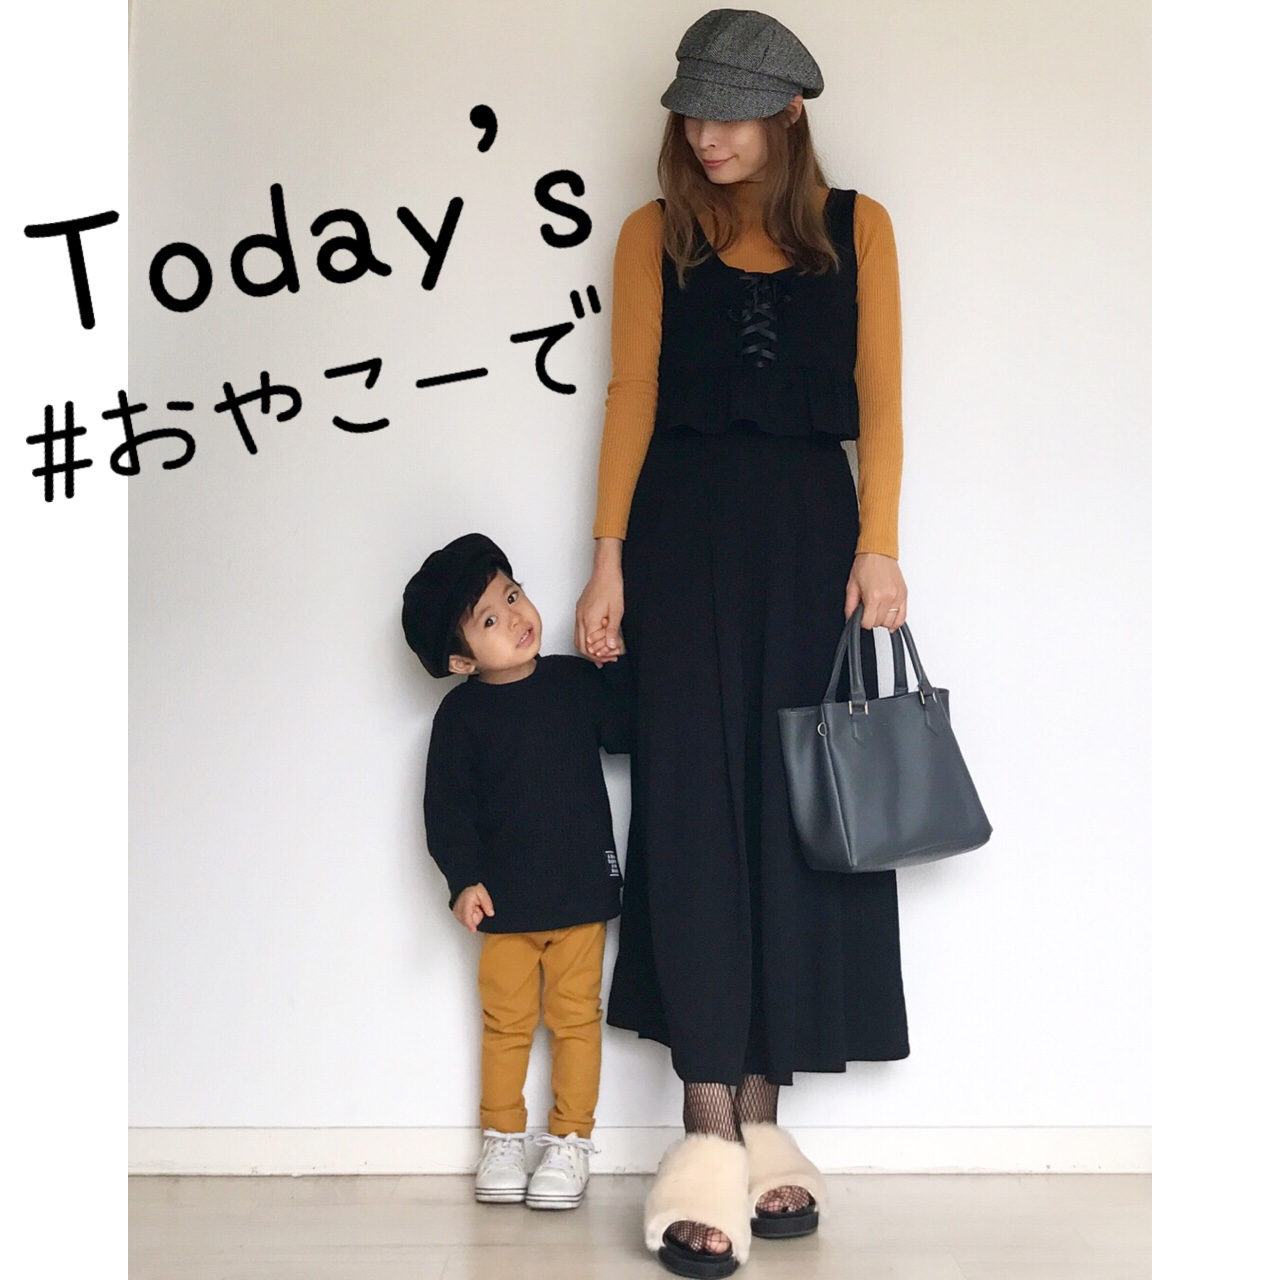 74f448089165a Fashion. mi-chan さん フォローする. 2  0.  おやこーで 親子コーデ リンク ...